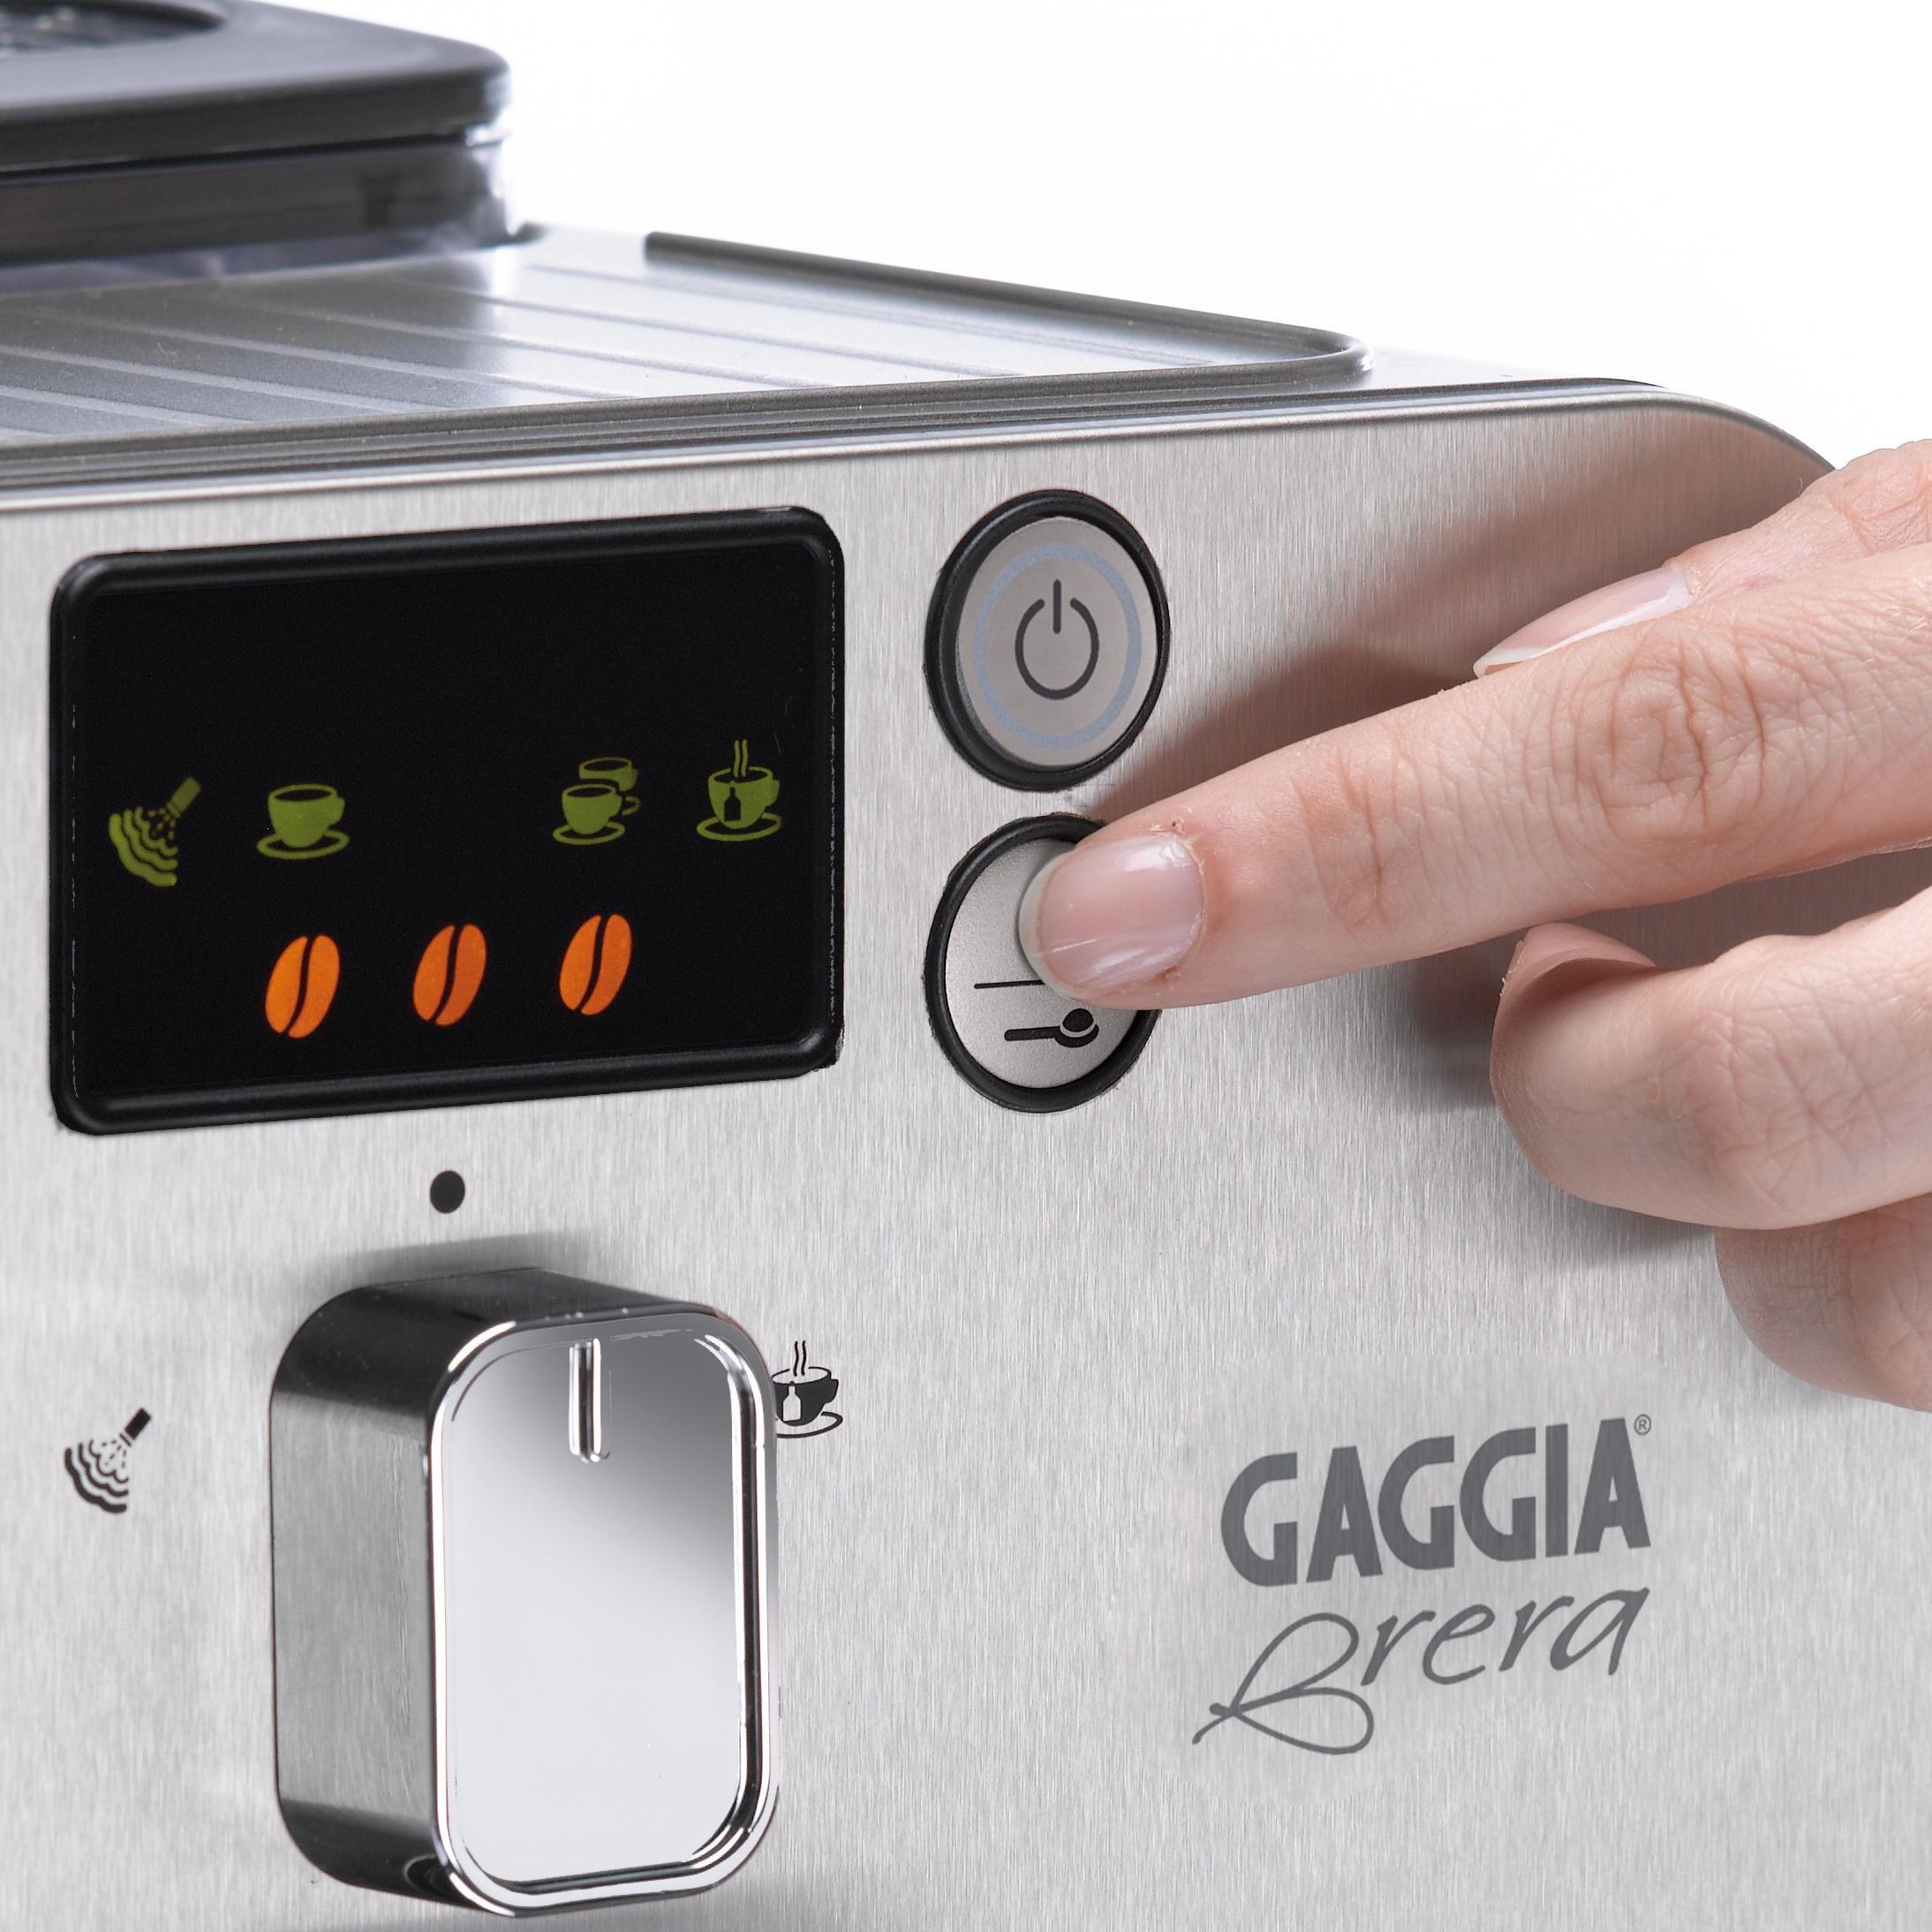 Gaggia Brera Super Automatic Espresso Machine in Silver. Pannarello Wand Frothing for Latte and Cappuccino Drinks. Espresso from Pre-Ground or Whole Bean Coffee. by Gaggia (Image #7)